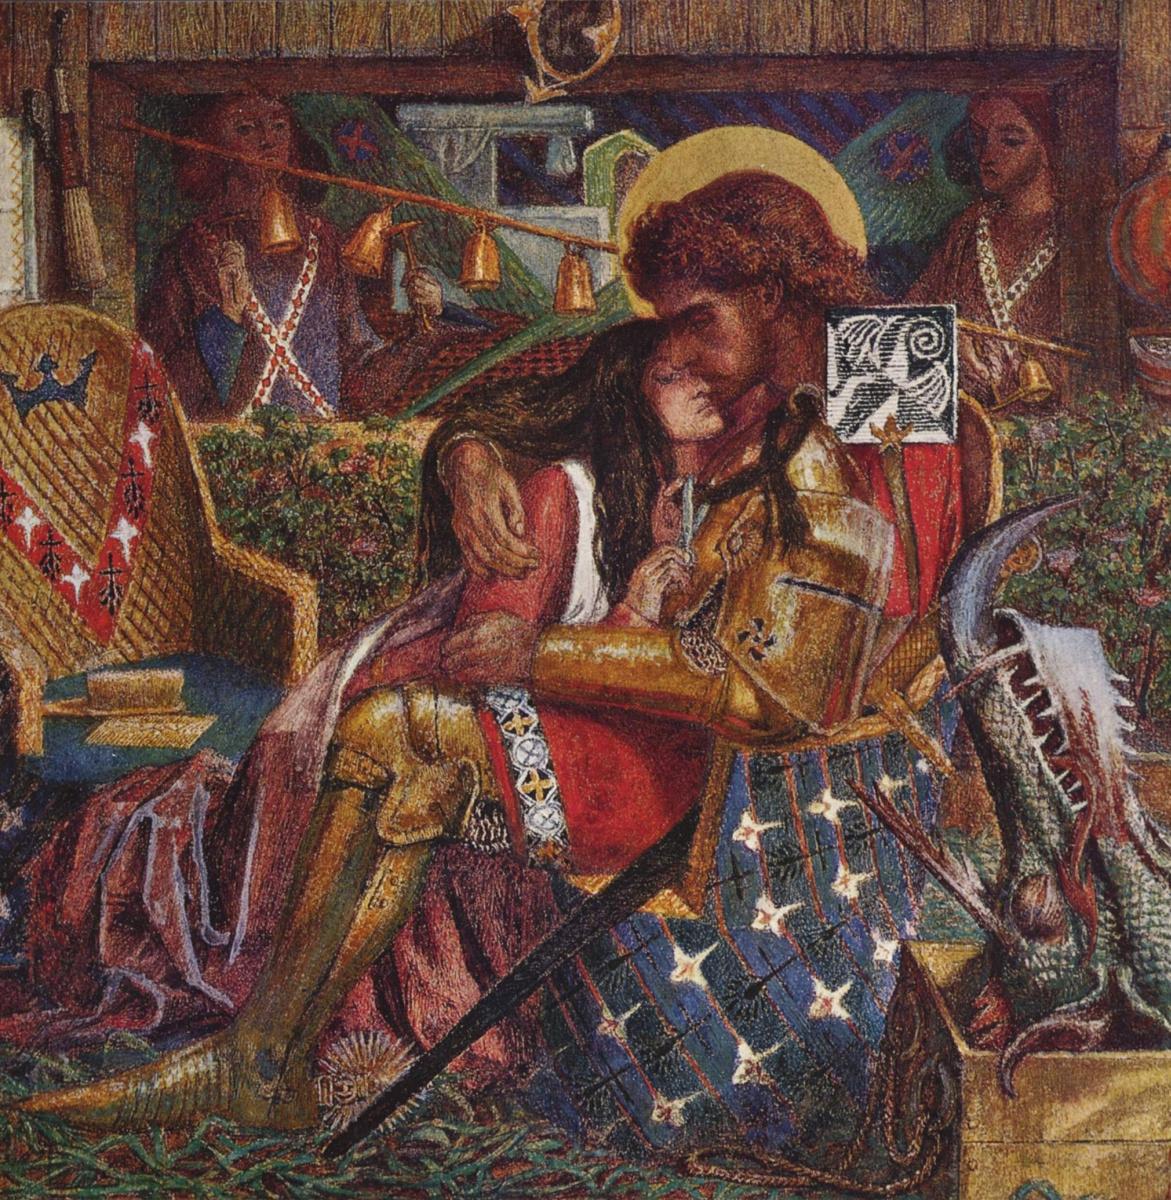 Dante Gabriel Rossetti. The wedding of Saint George and Princess Sabra